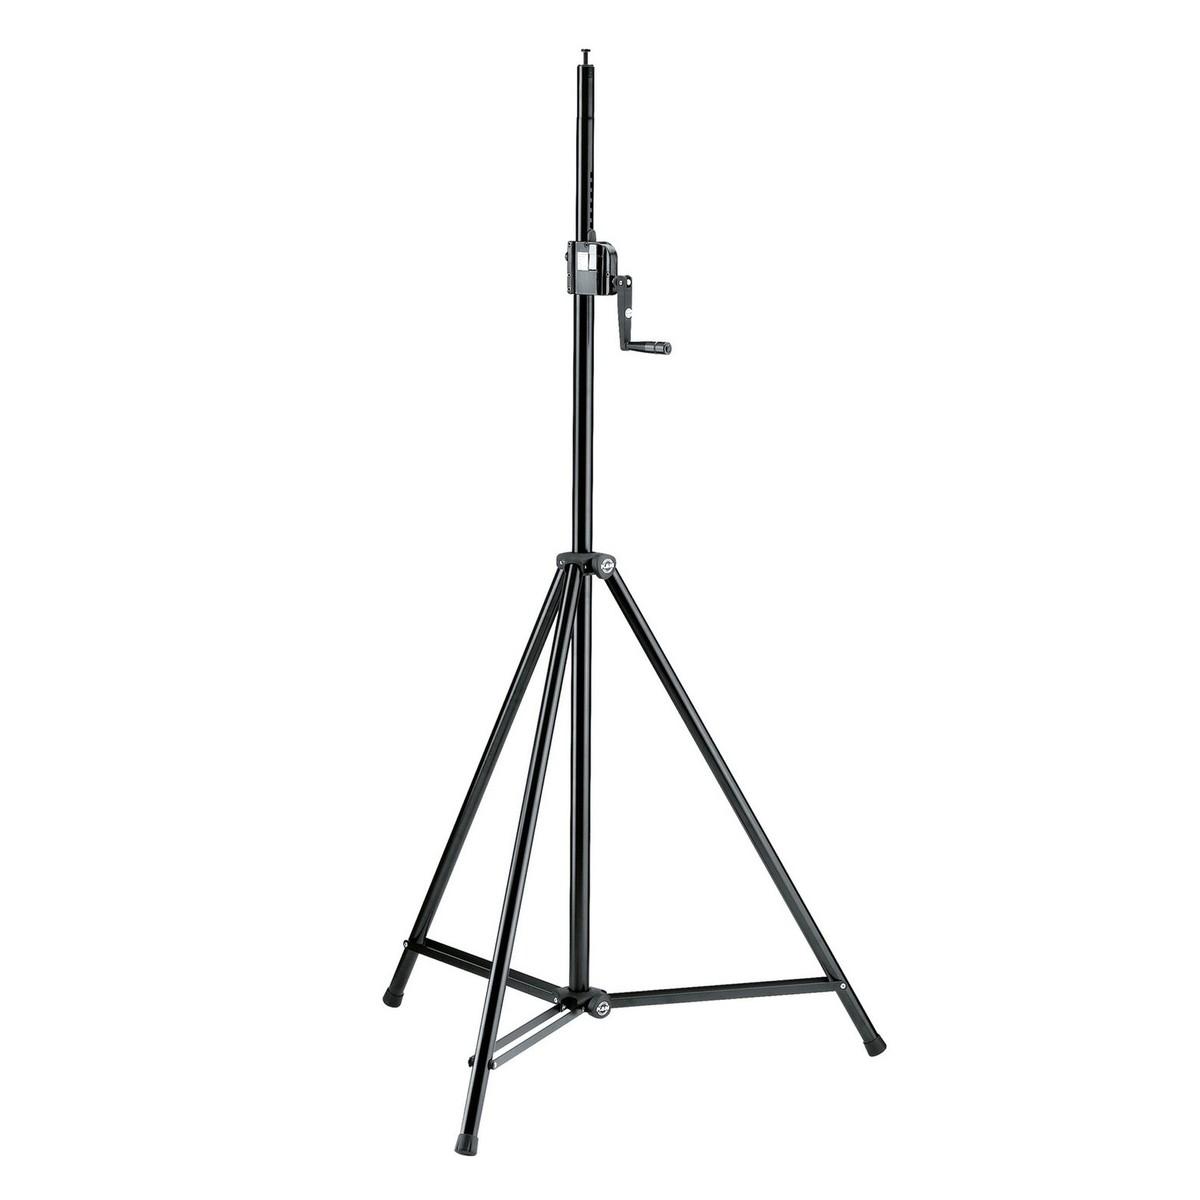 K&M 246/1 Lighting/Speaker Stand, Black at Gear4music